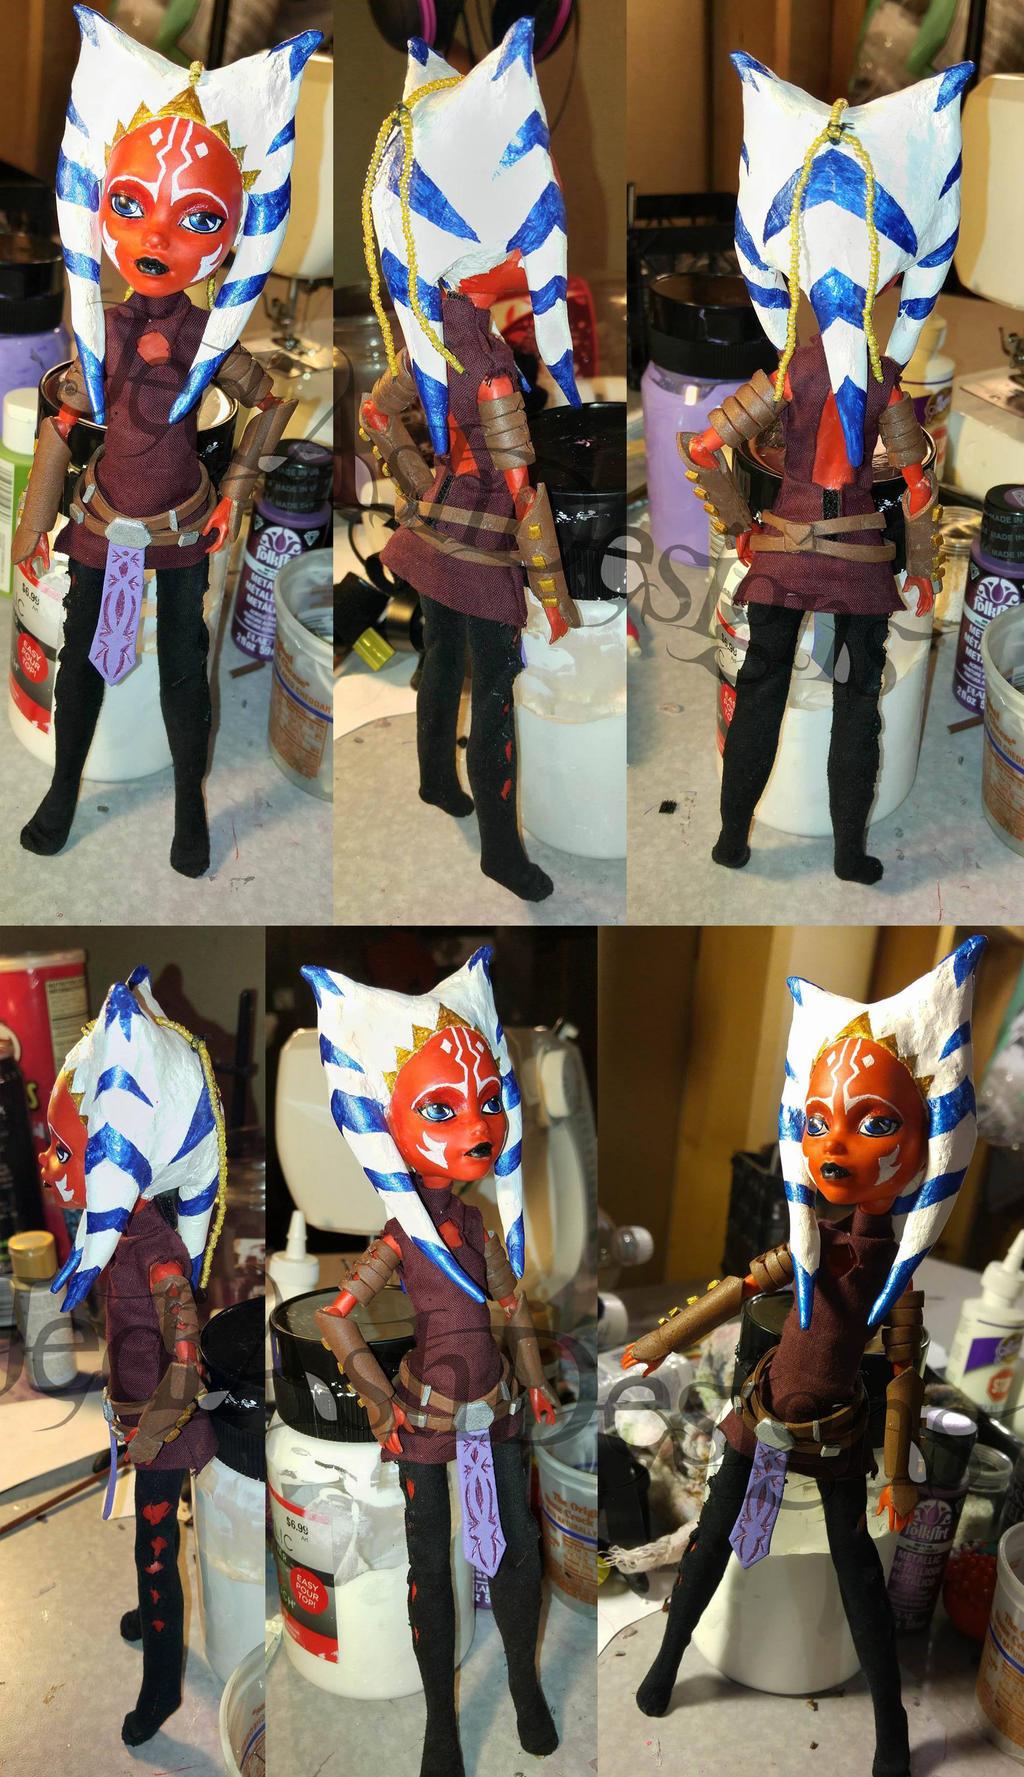 Ahsoka Tano Star Wars: The Clone Wars One Sixth Scale